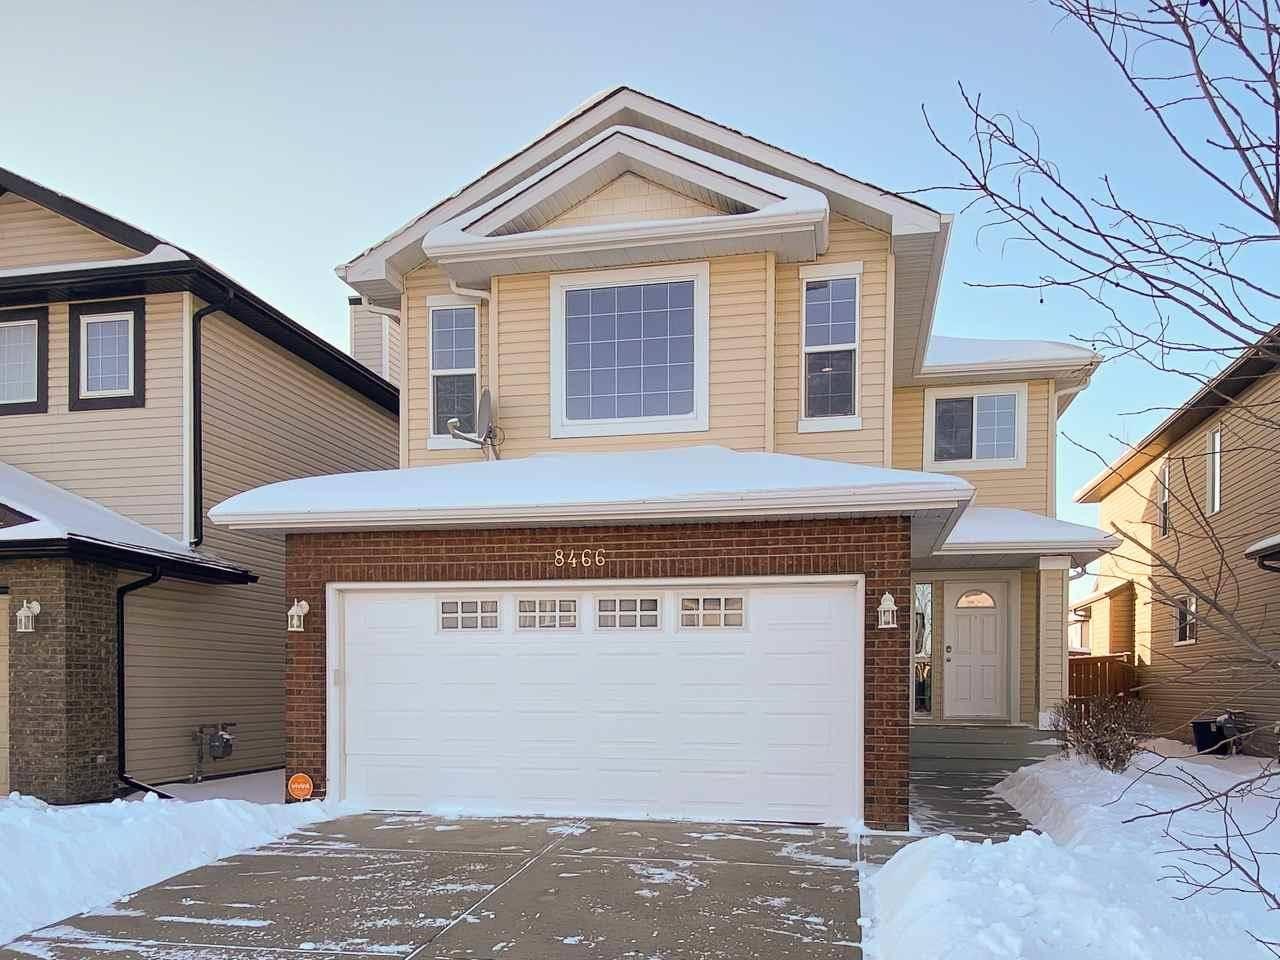 House for sale at 8466 Sloane Cres Nw Edmonton Alberta - MLS: E4184198